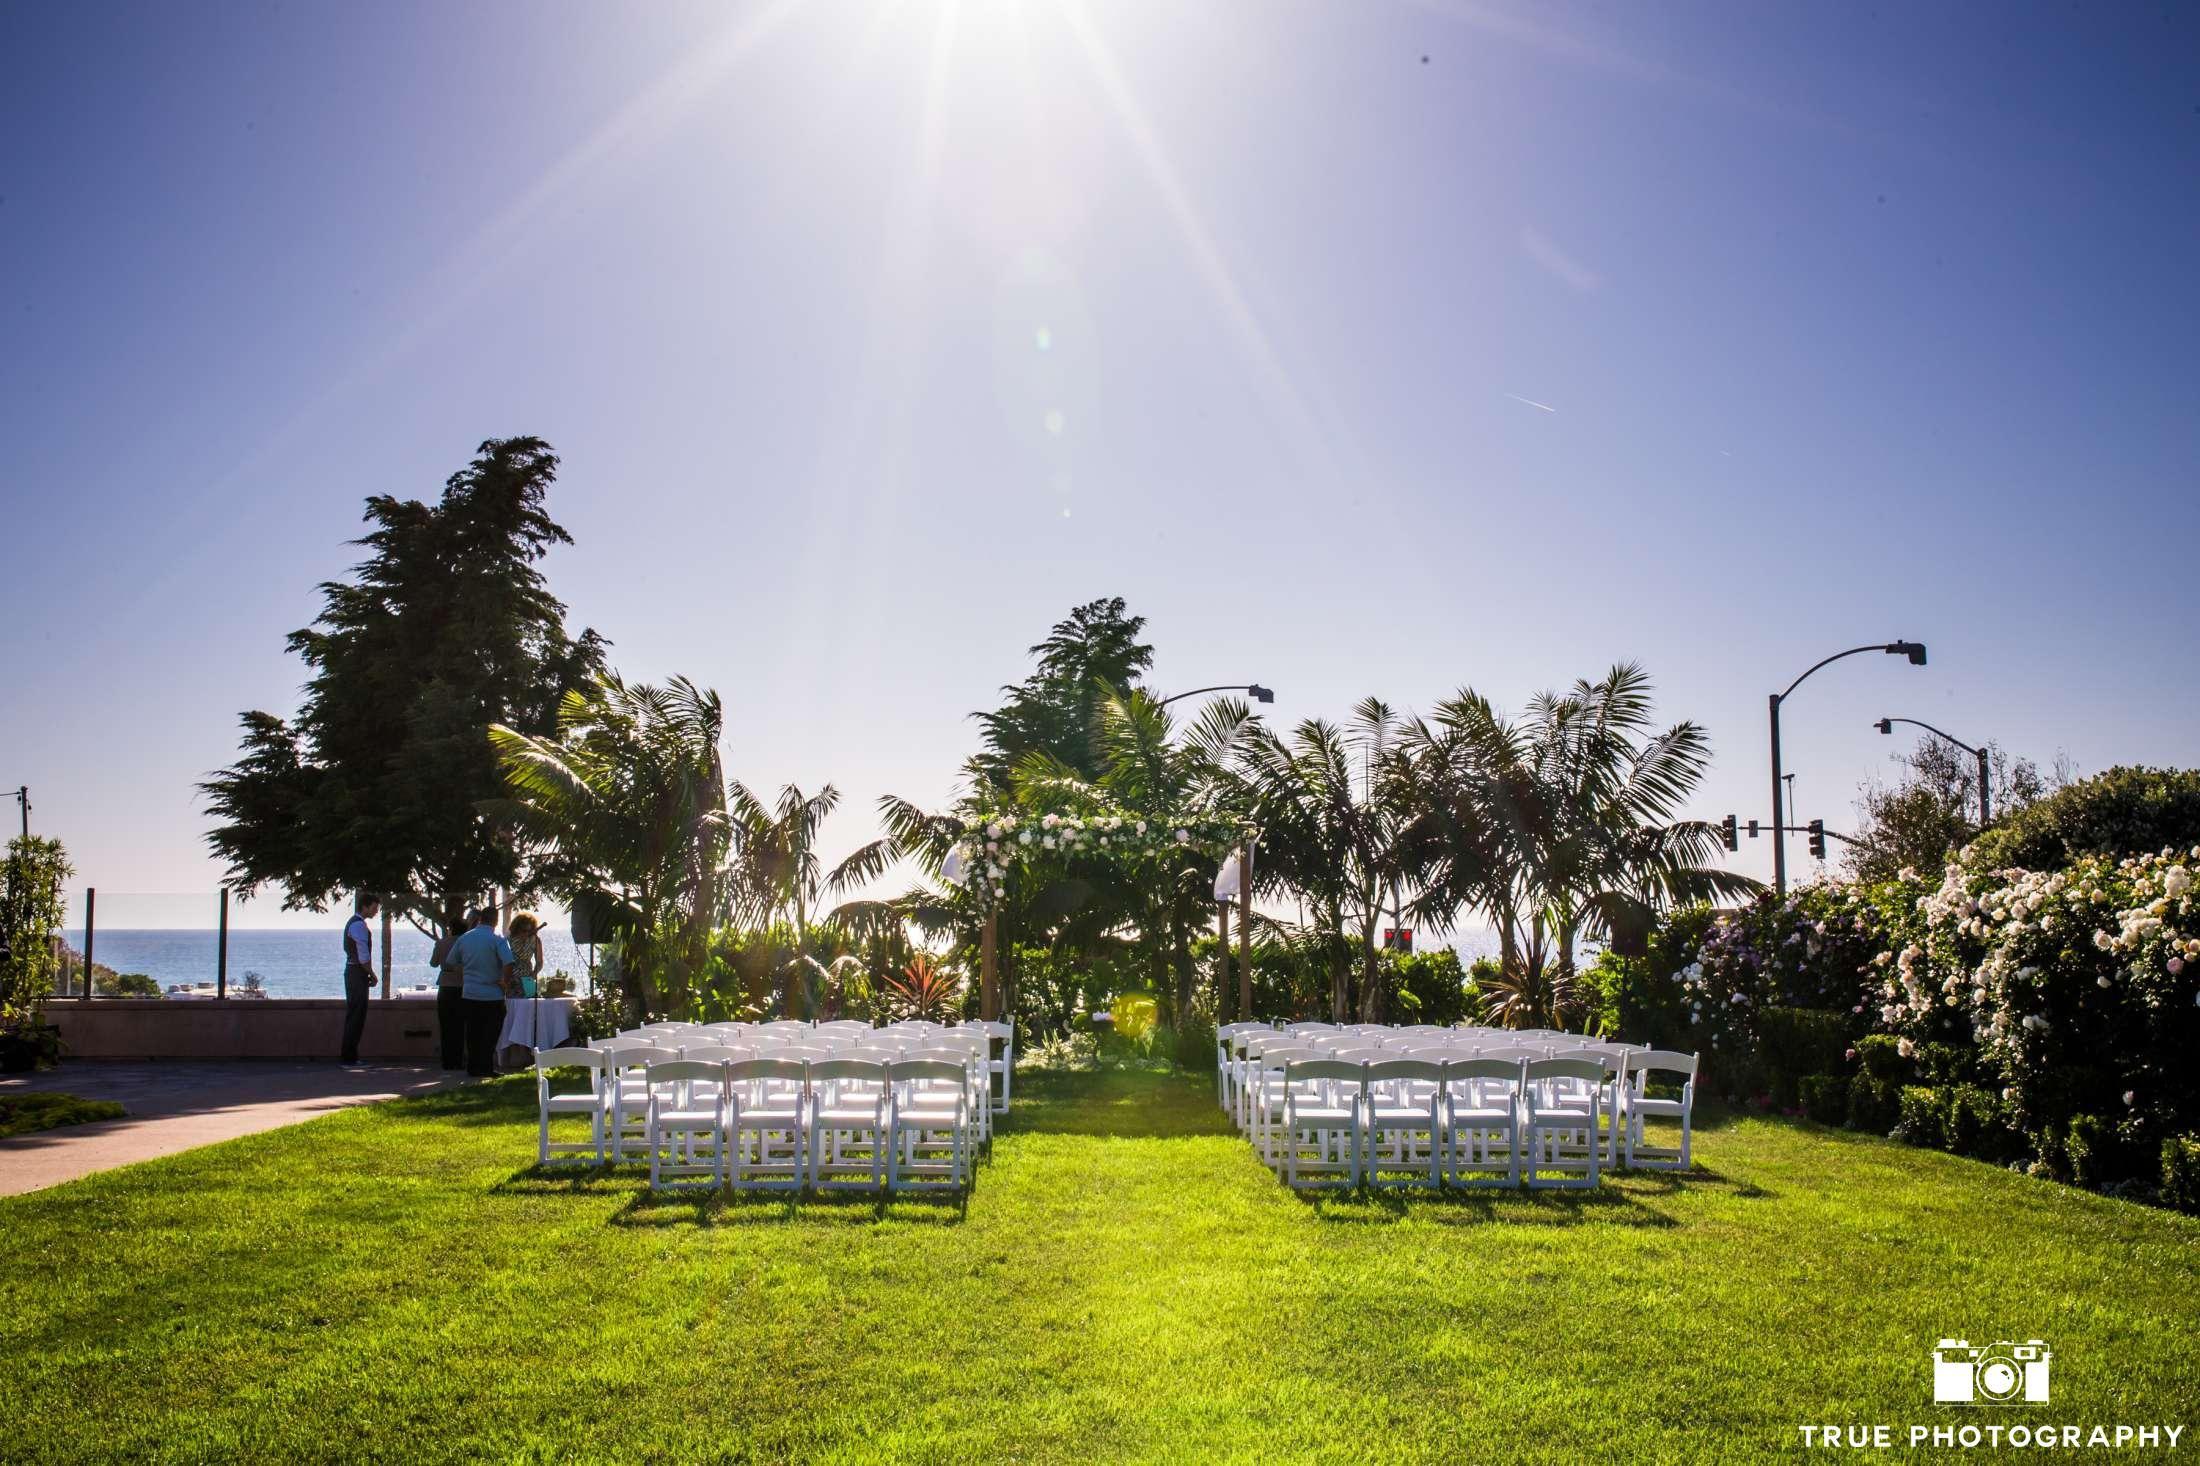 Carlsbad Beach Resort Cape Rey A Hilton Wedding Ceremony Venue Weddingphotography From